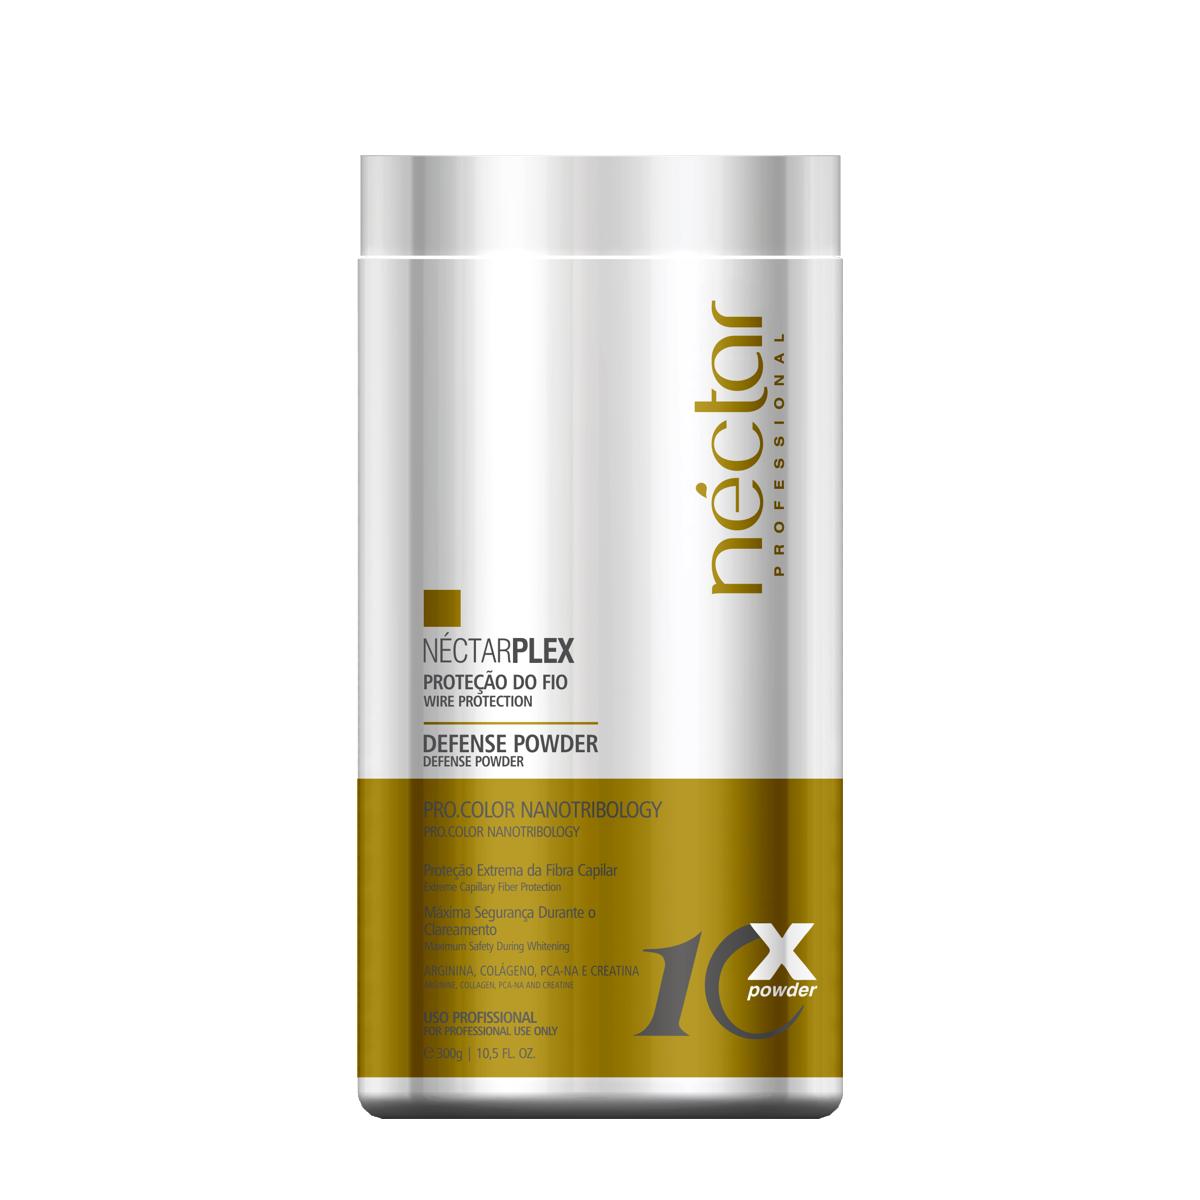 Defense Powder Néctar Plex em Pó 300h - Profissional